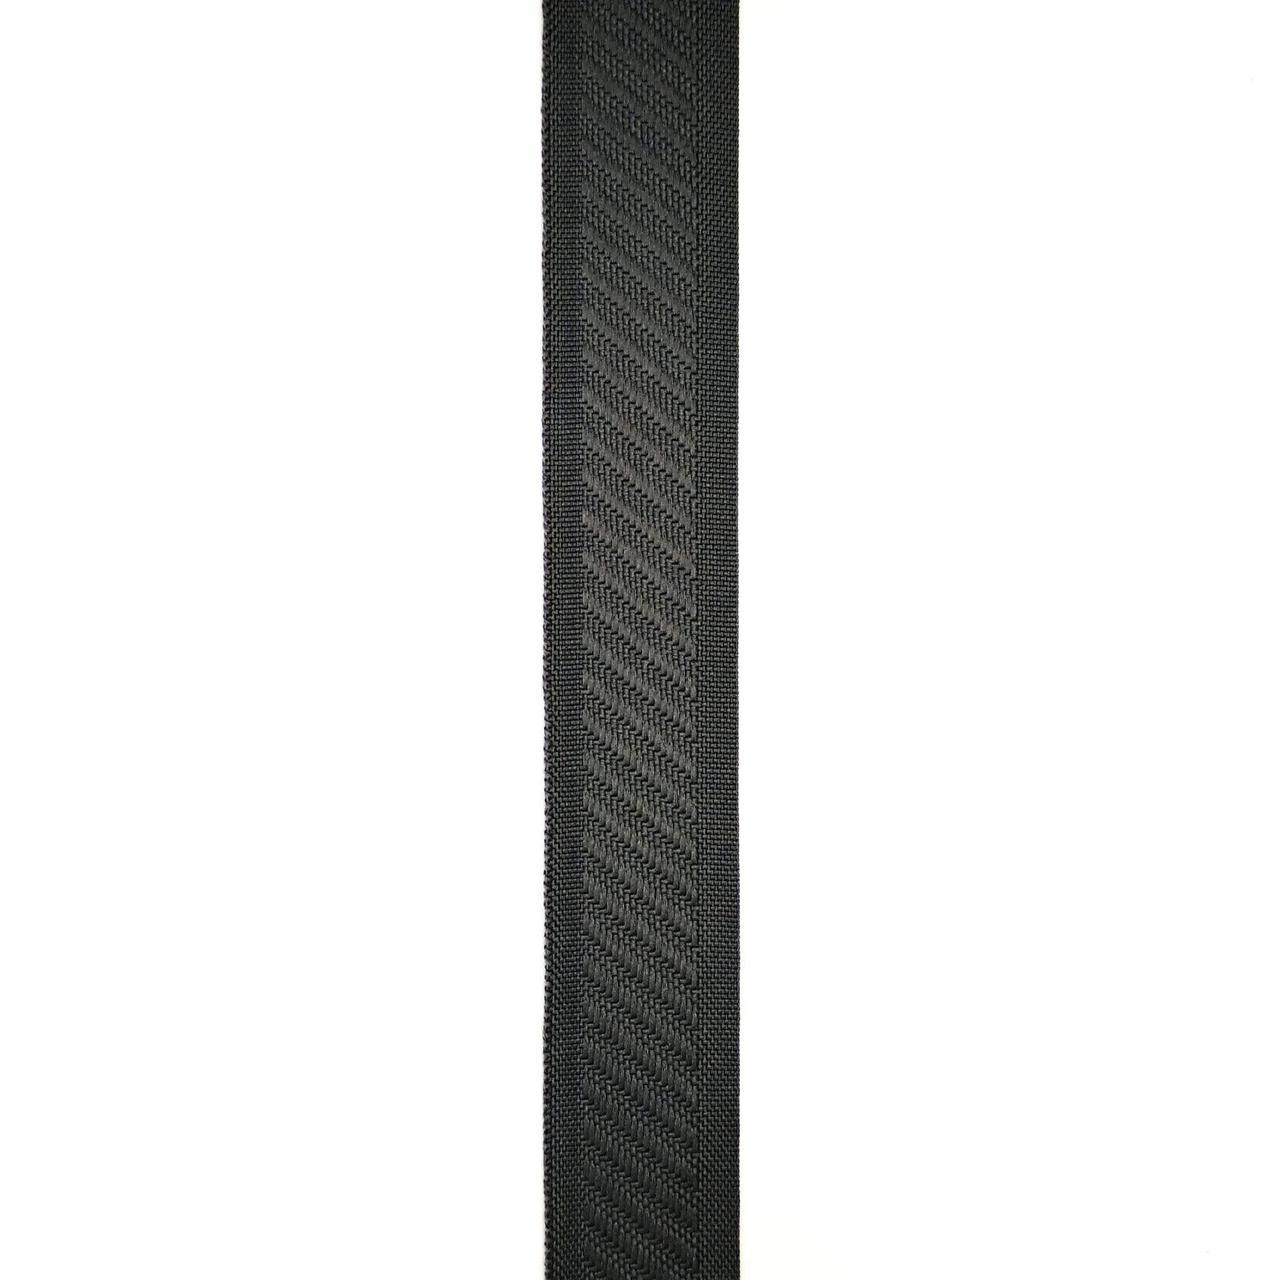 Лента отделочная одеяльная 25 мм (50м/рулон)